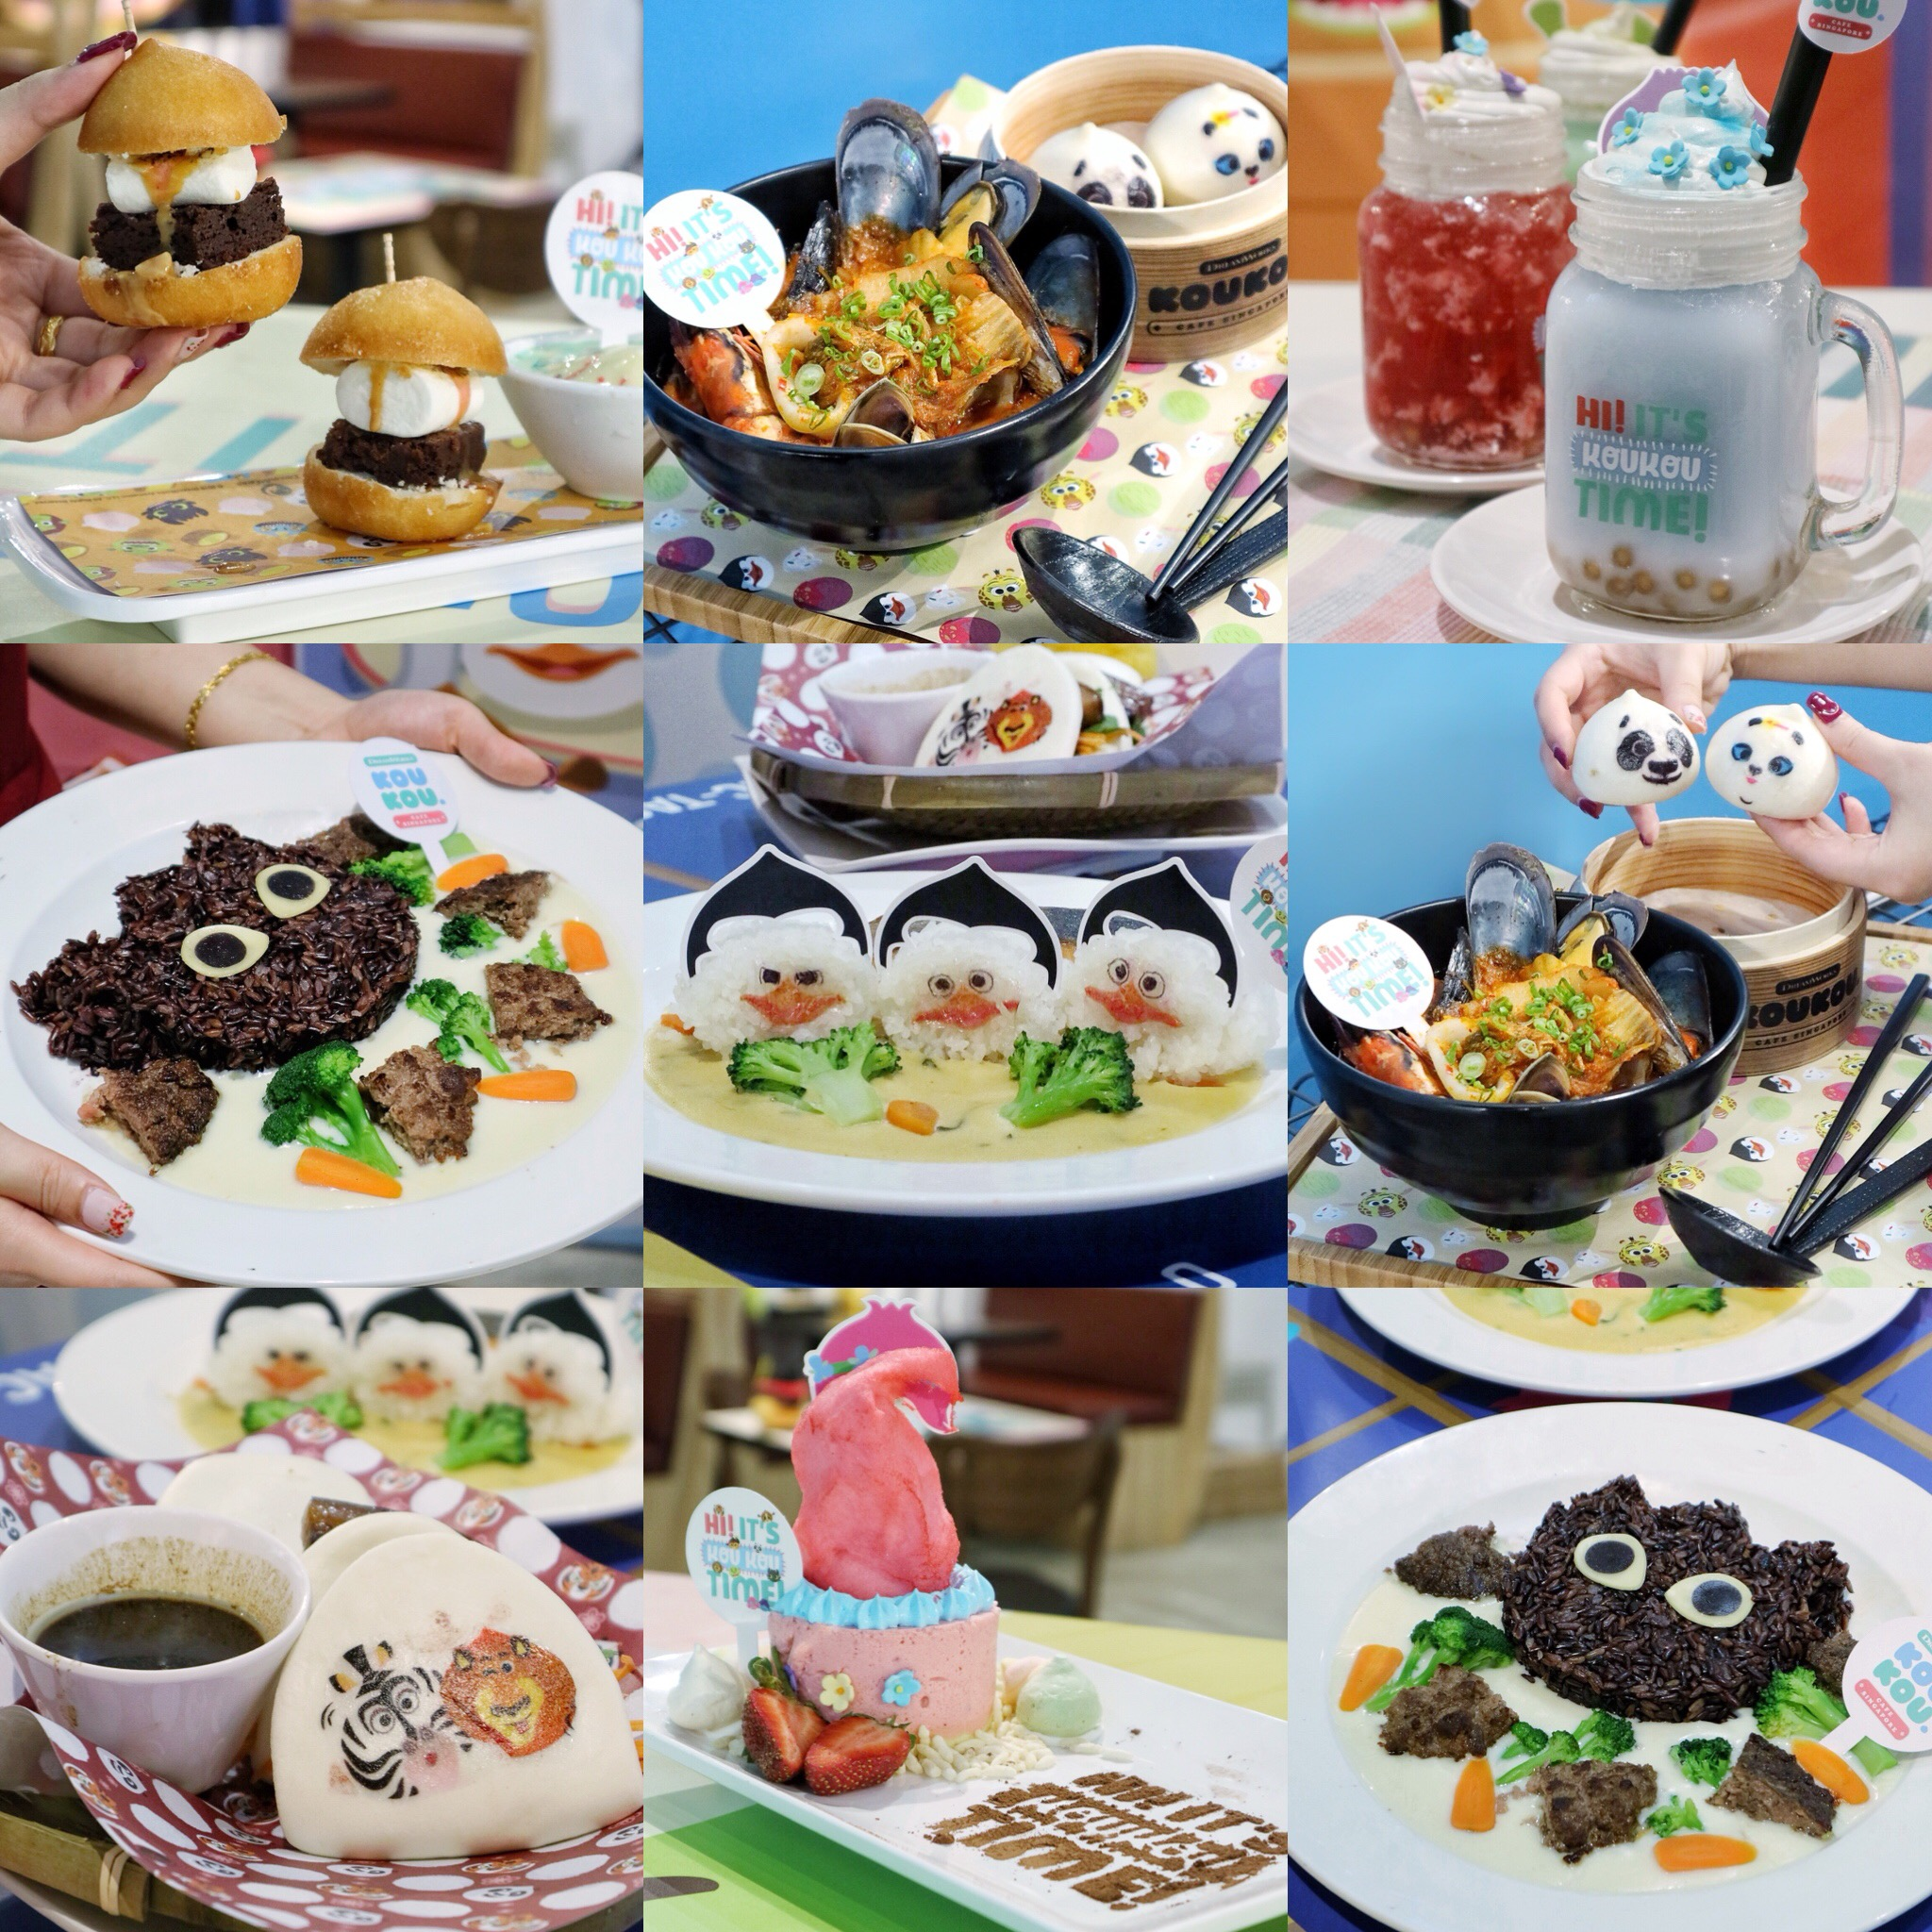 (NEW) DreamWorks KouKou Café: Popular DreamWorks Characters Comes To Life at Bugis +